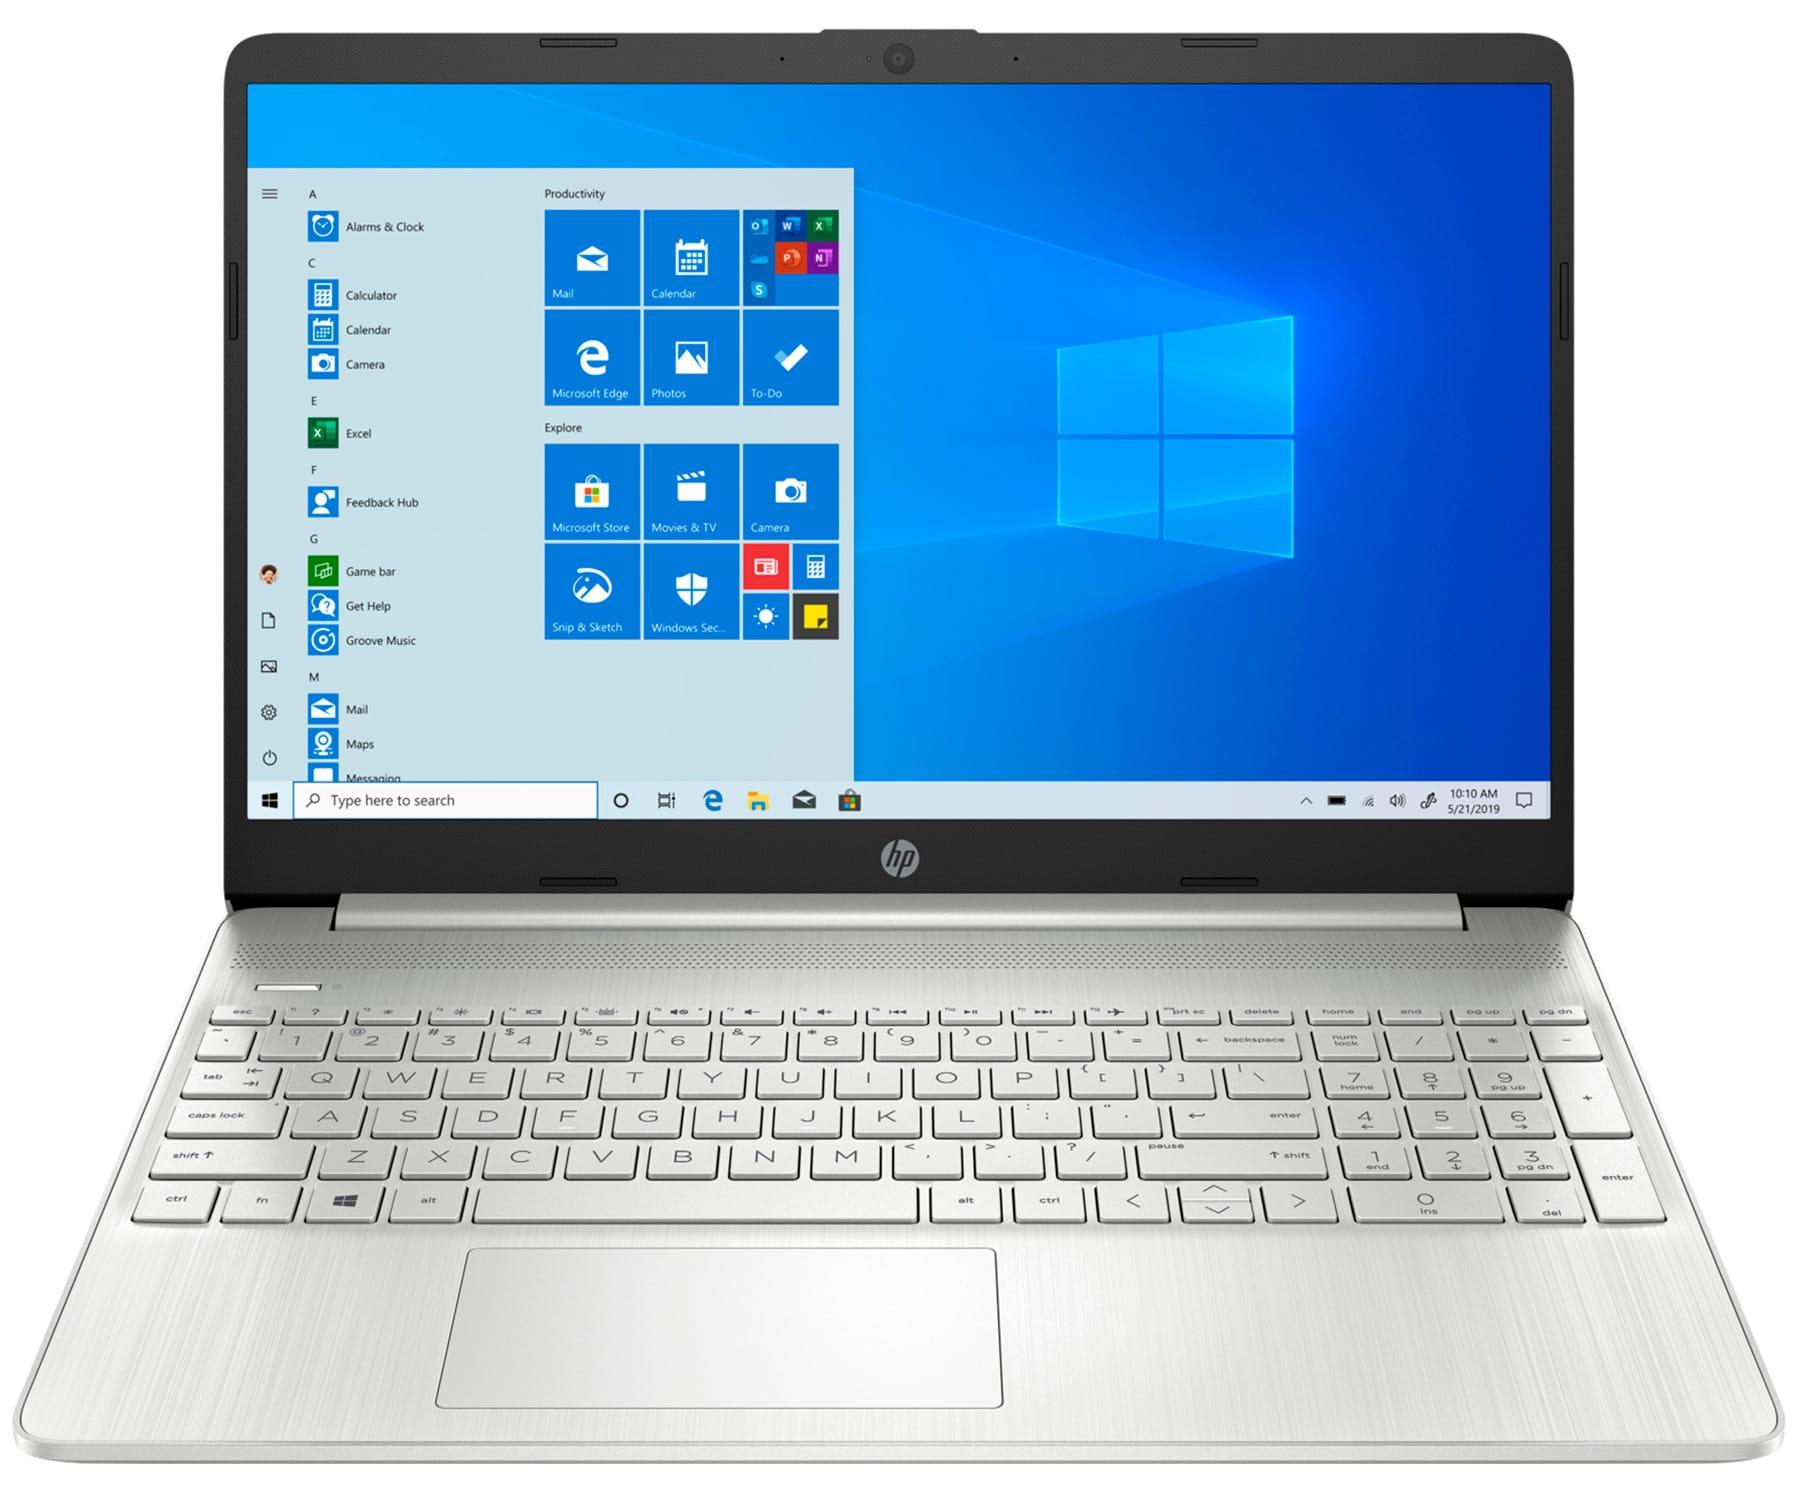 HP LAPTOP 15s-EQ1090 PLATA PORTÁTIL 15.6'' HD AMD RYZEN 5-4500U 256GB SSD 8GB RAM WINDOWS 10 HOME